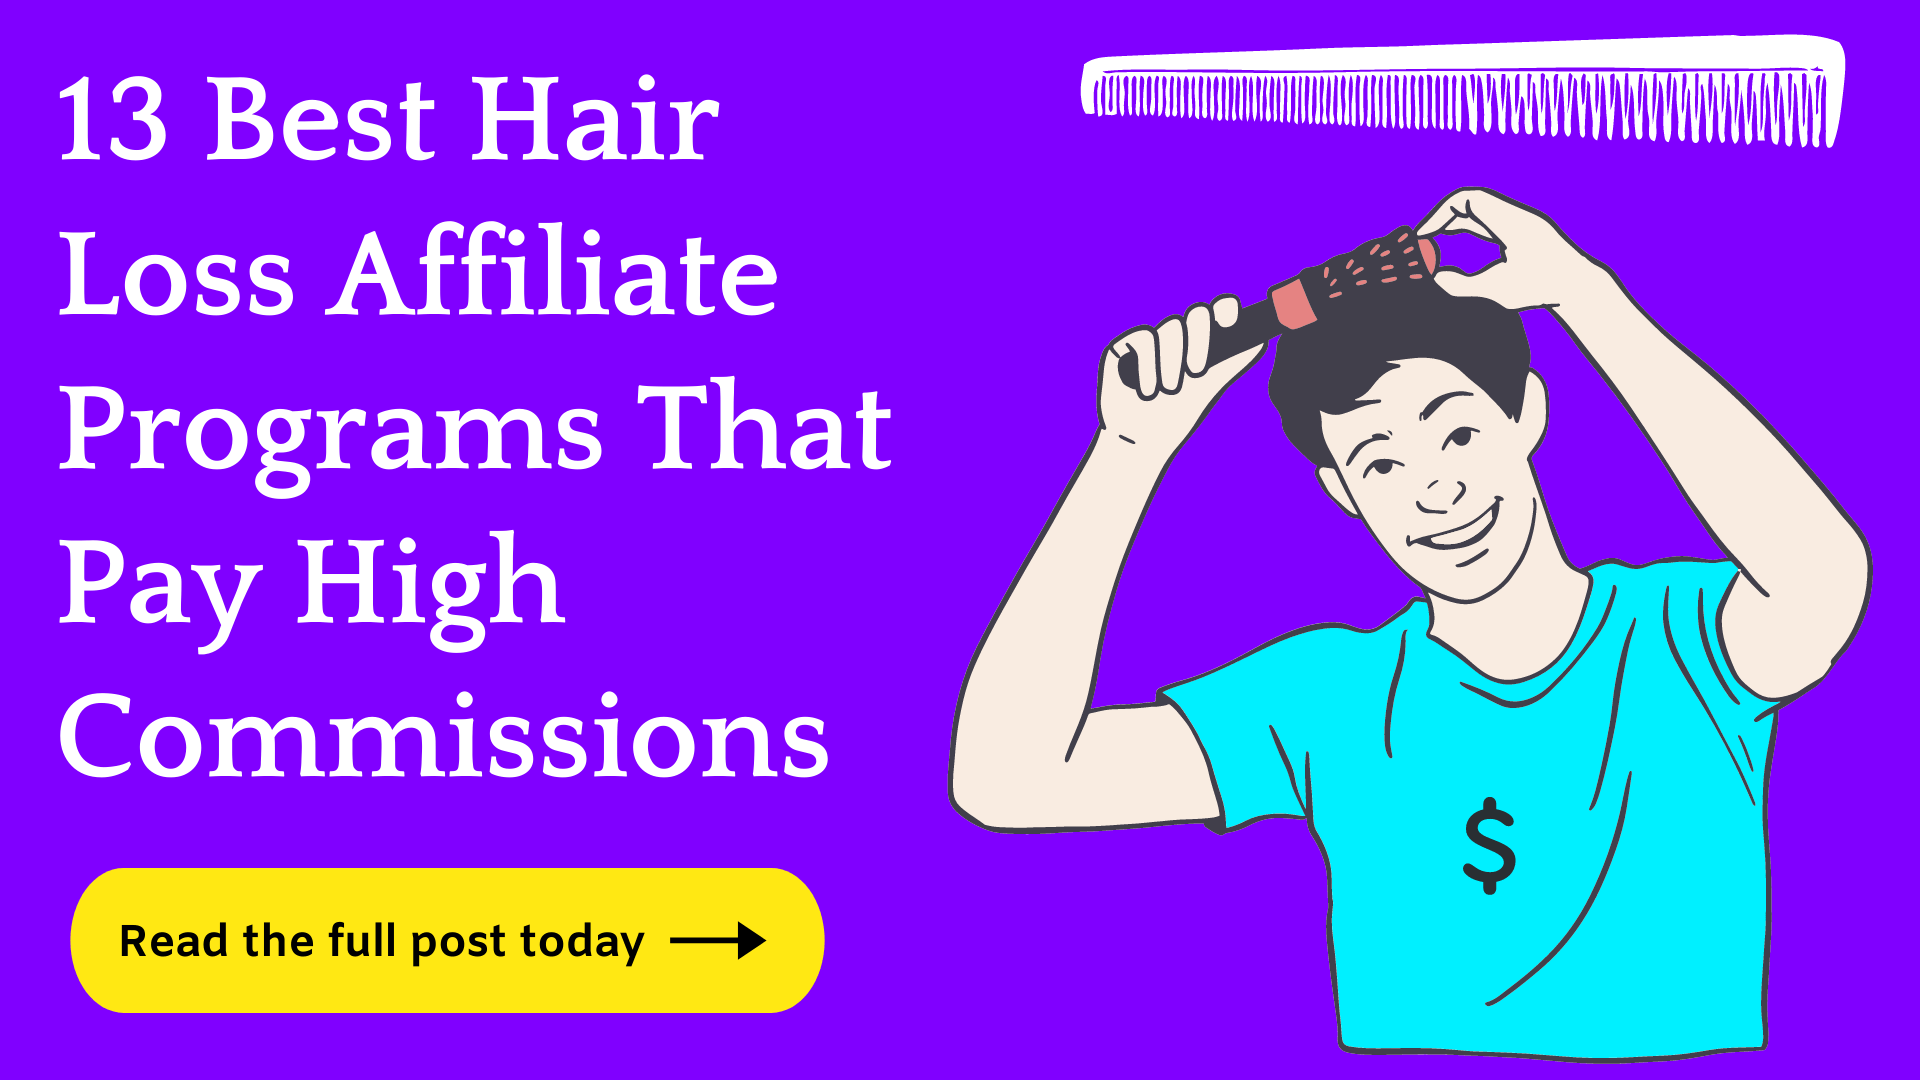 Hair Loss Affiliate Programs